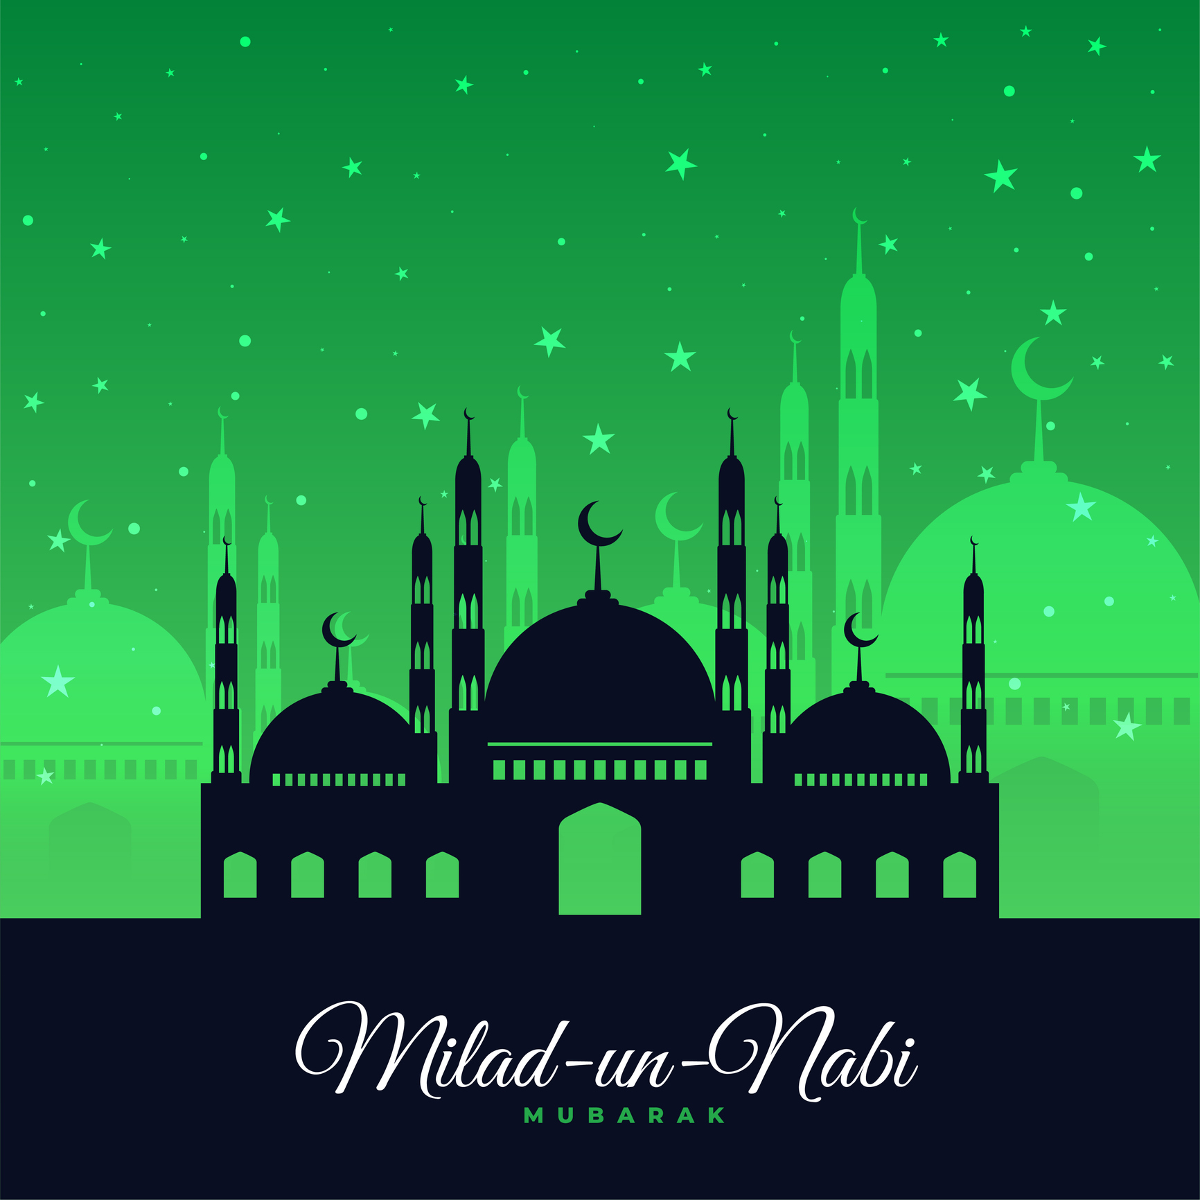 Eid Milad-un-Nabi wishes in English.